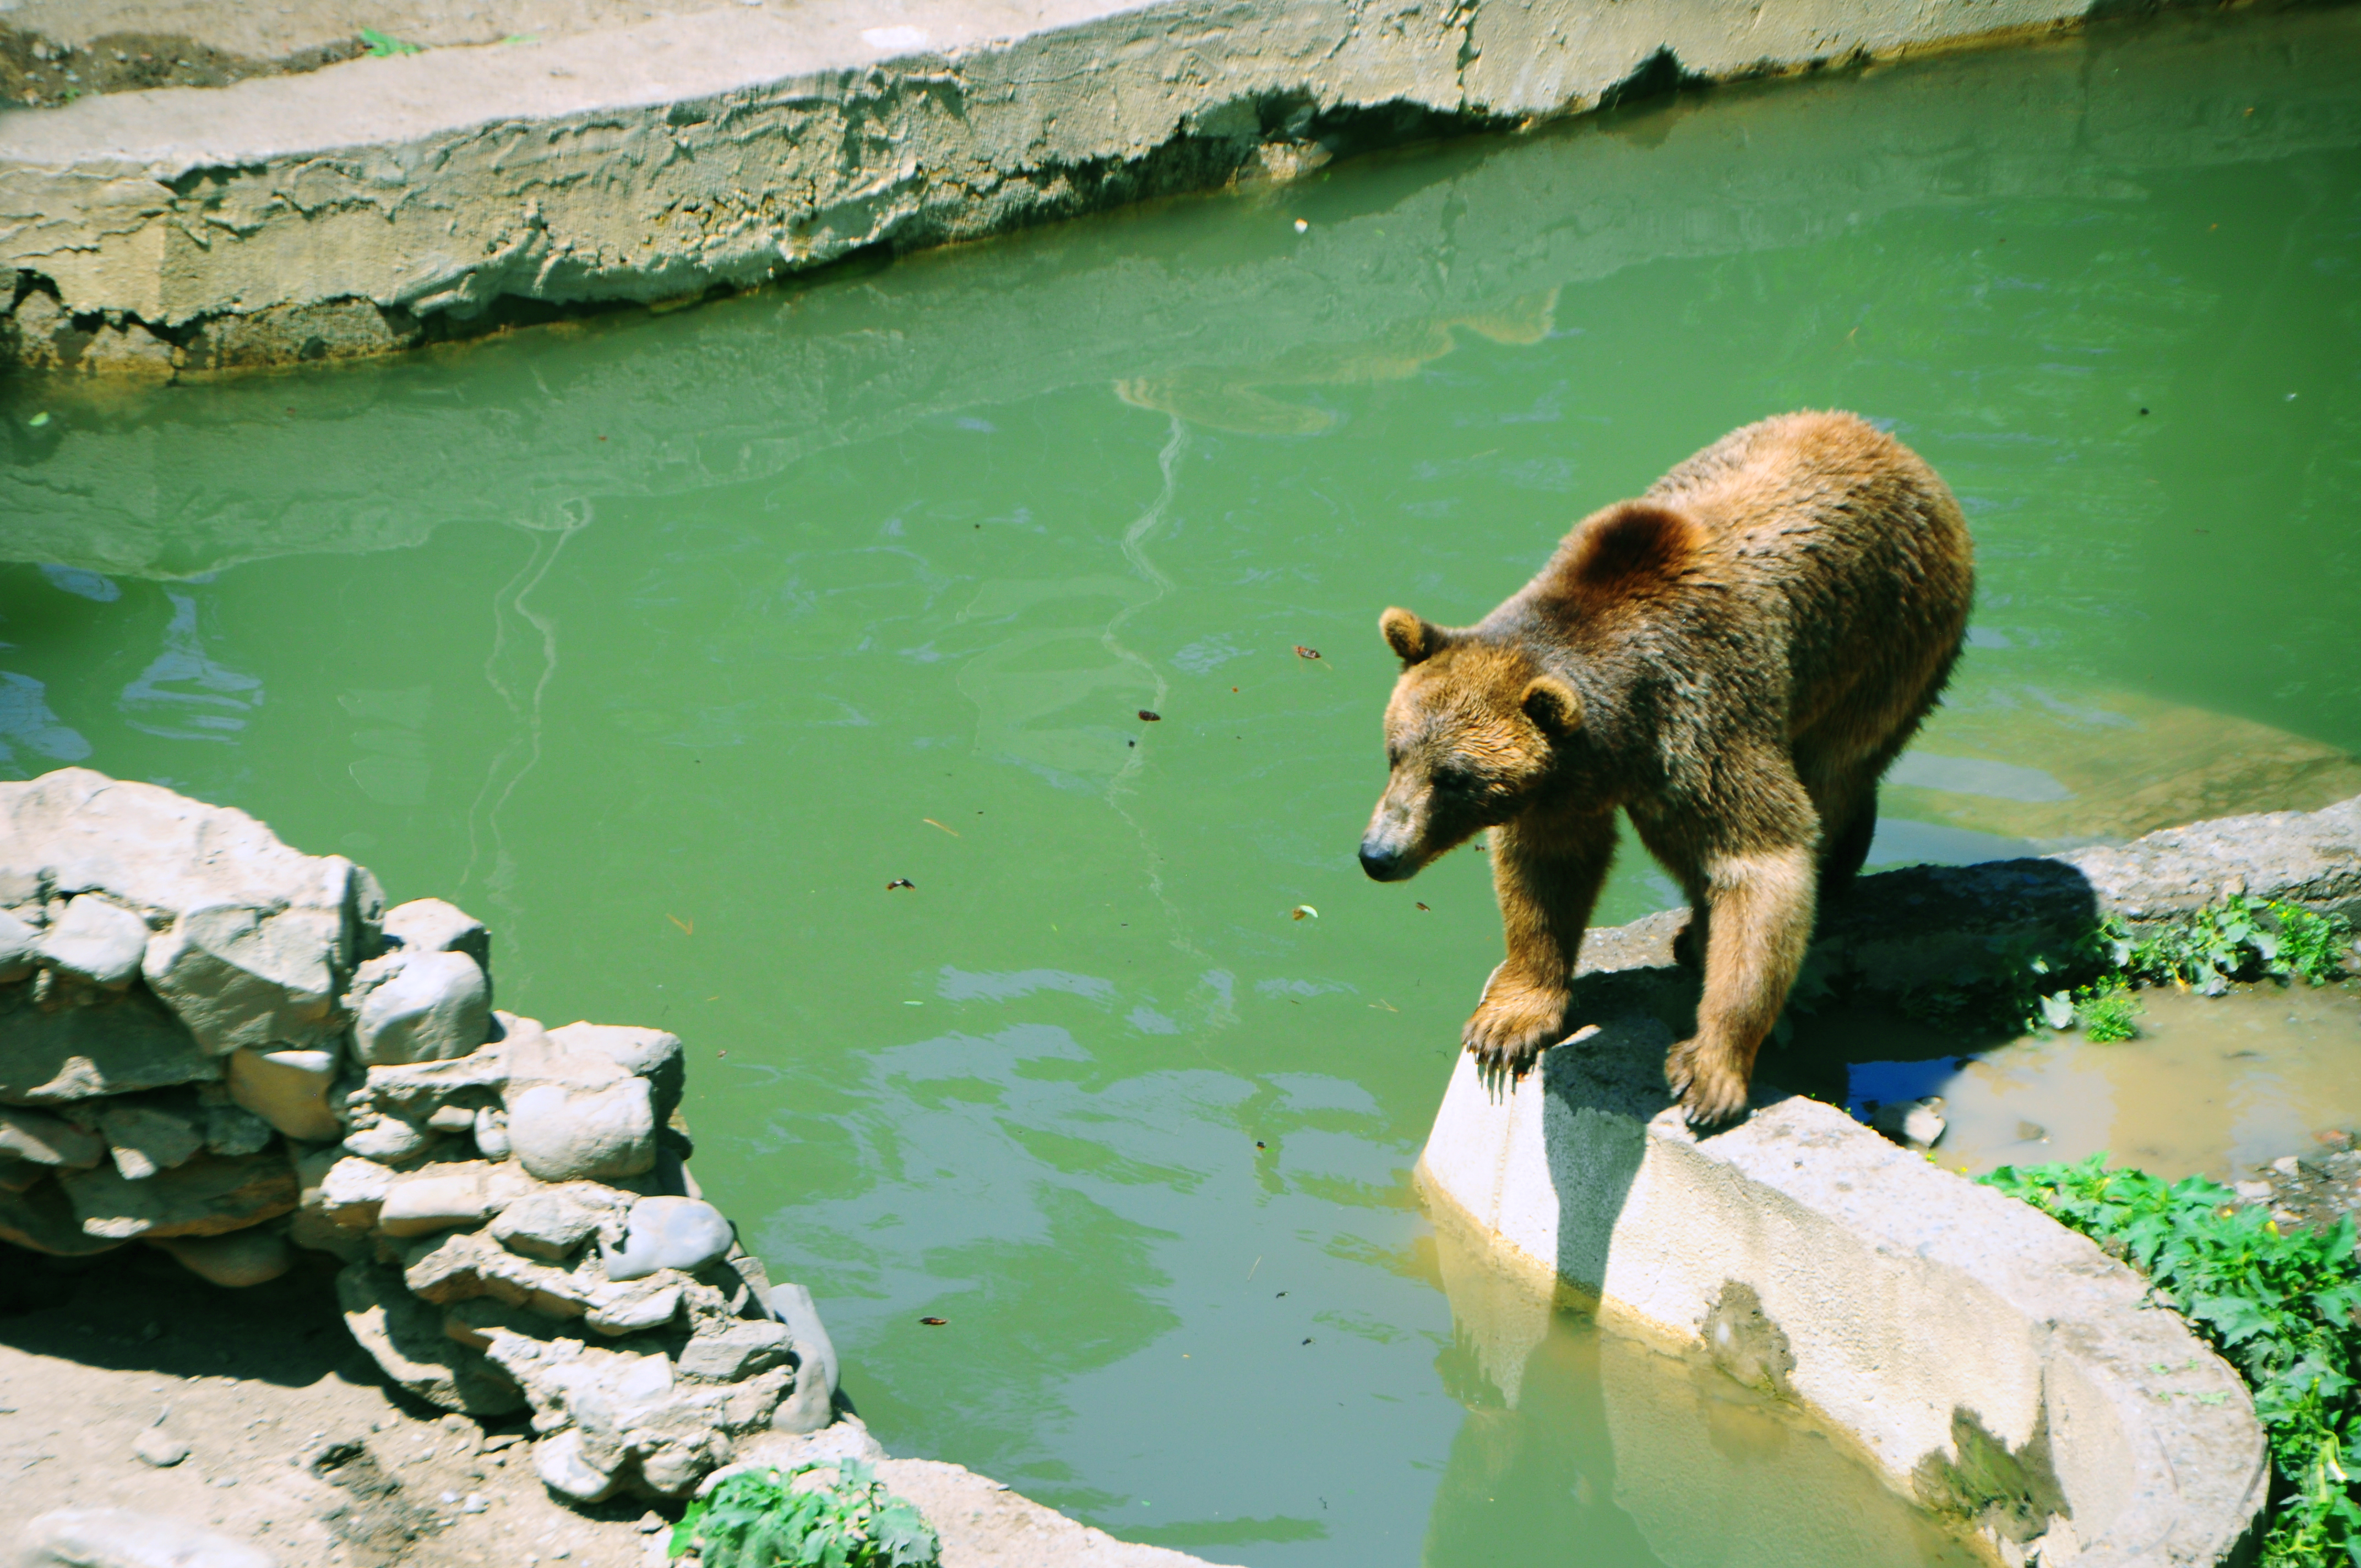 https://upload.wikimedia.org/wikipedia/commons/d/d4/Tbilisi_zoo_bear.jpg